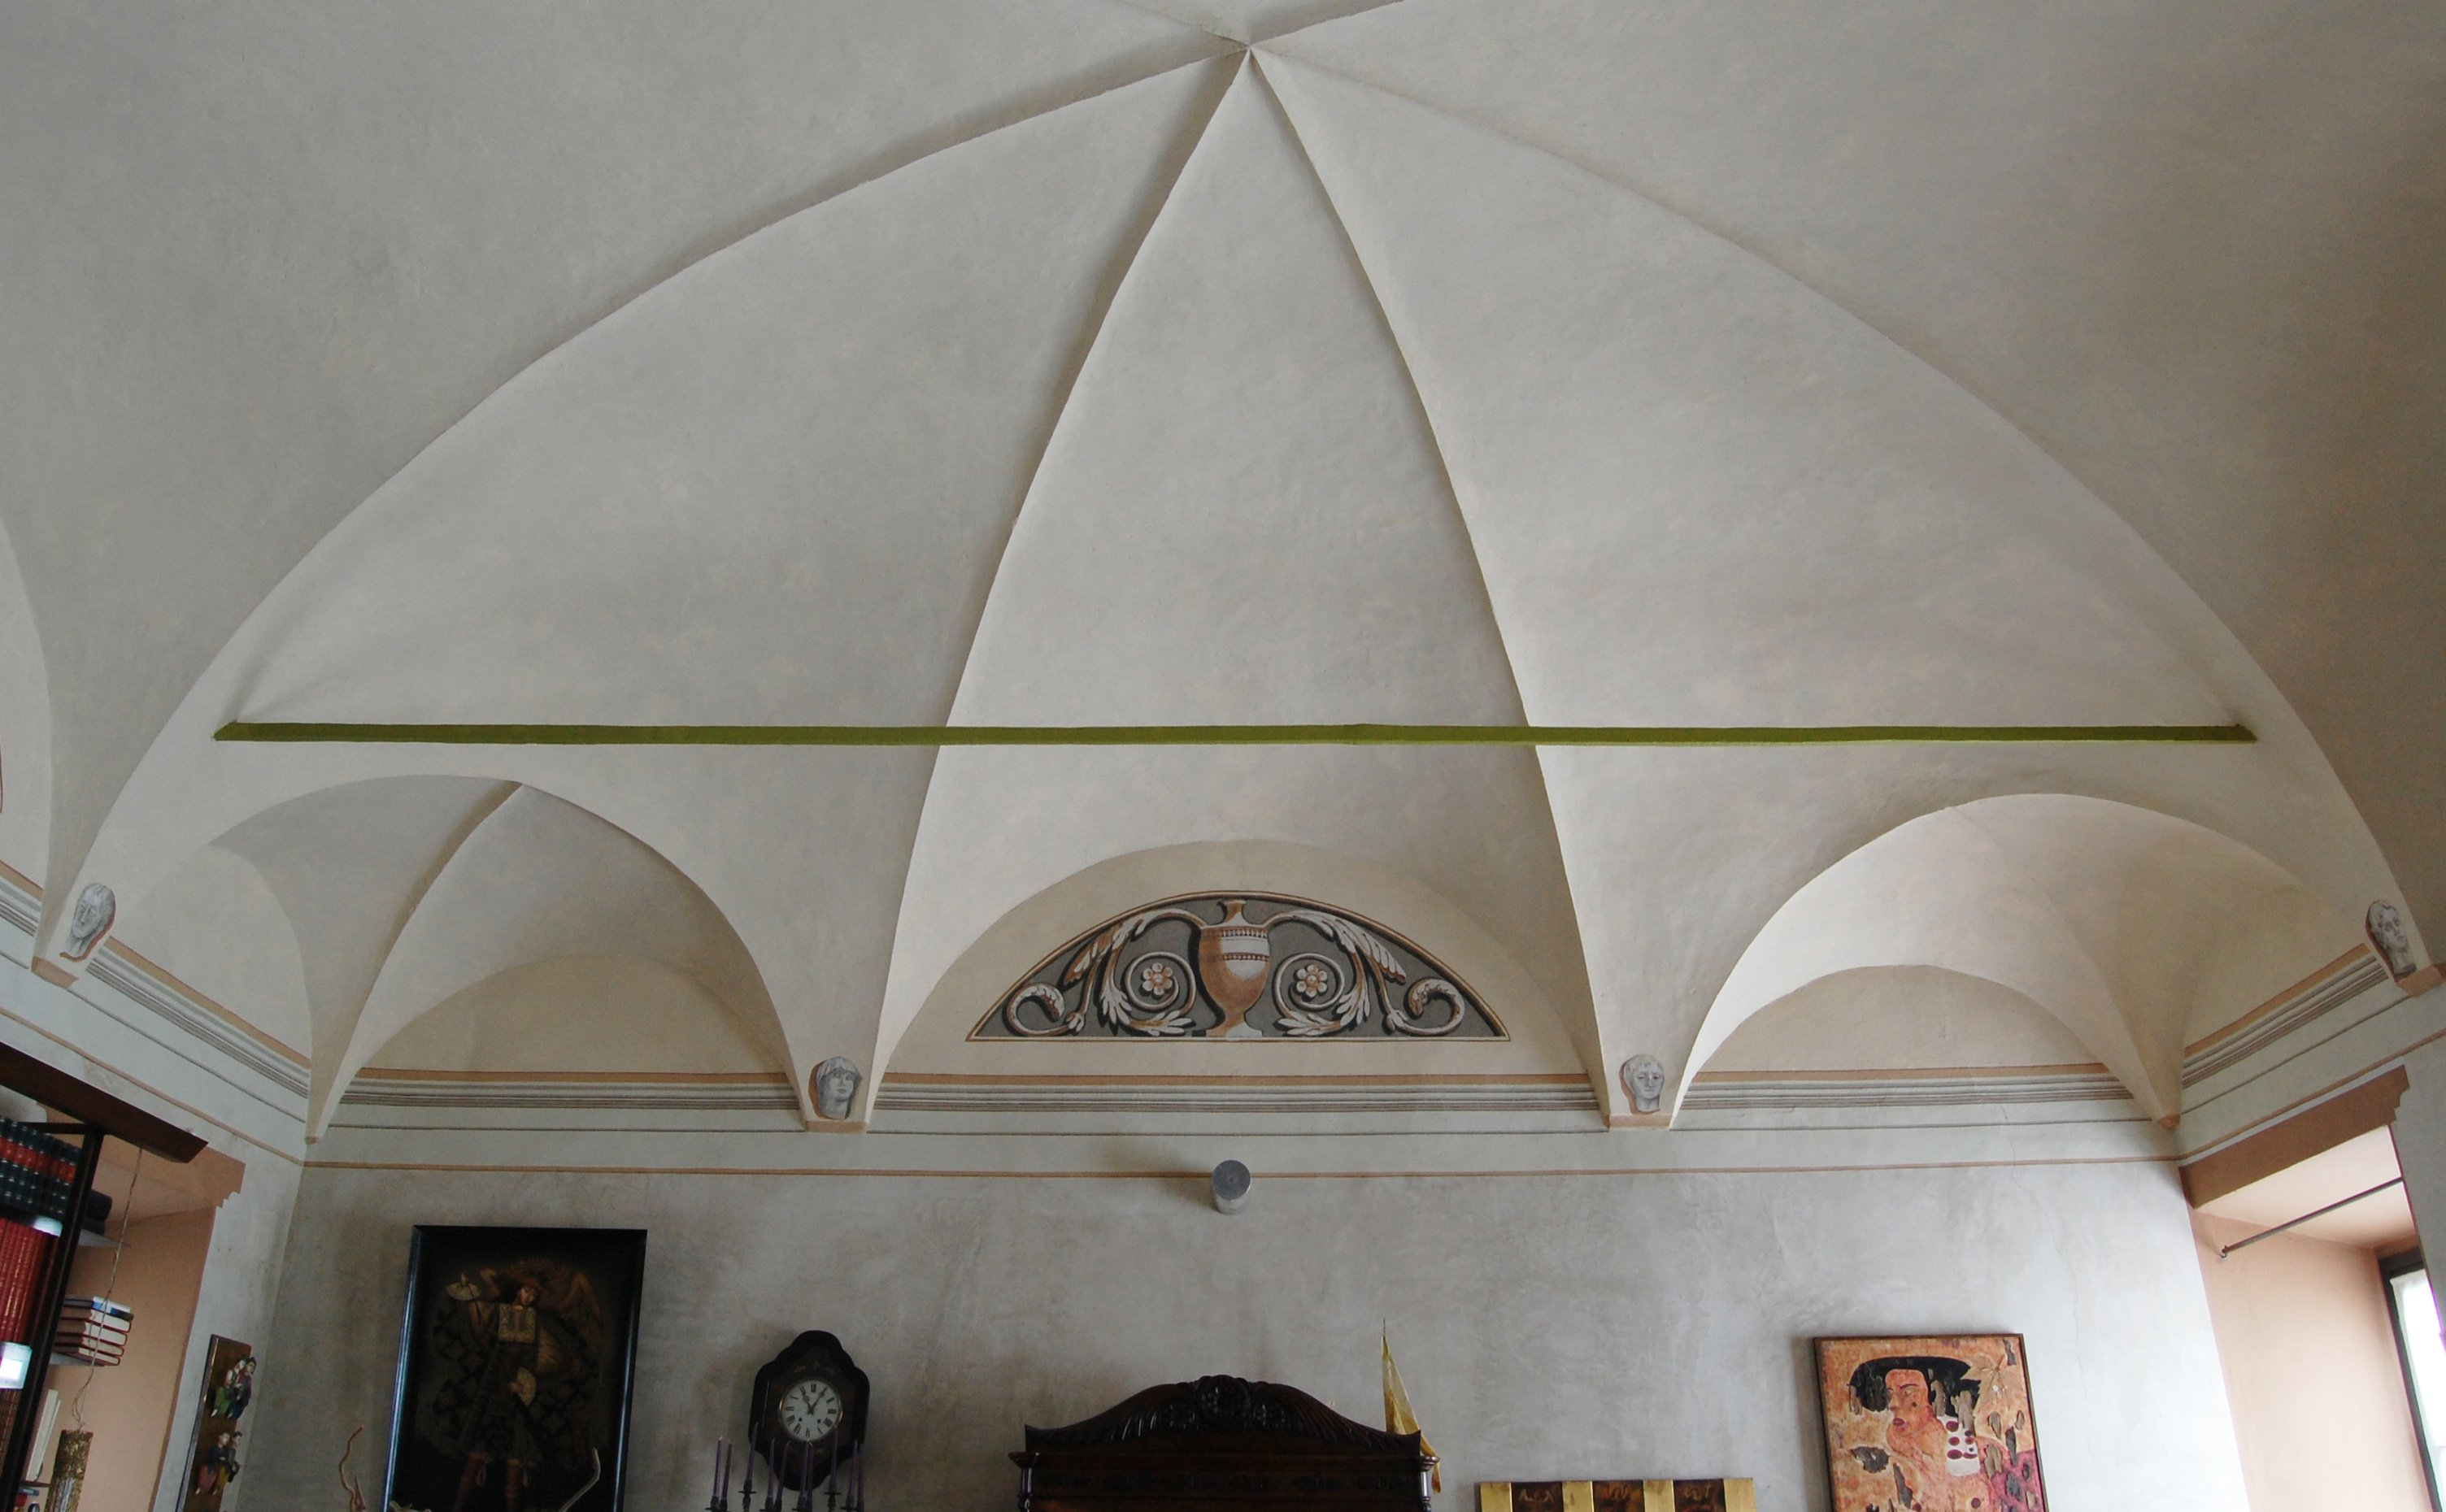 Monastero Lambrugo I